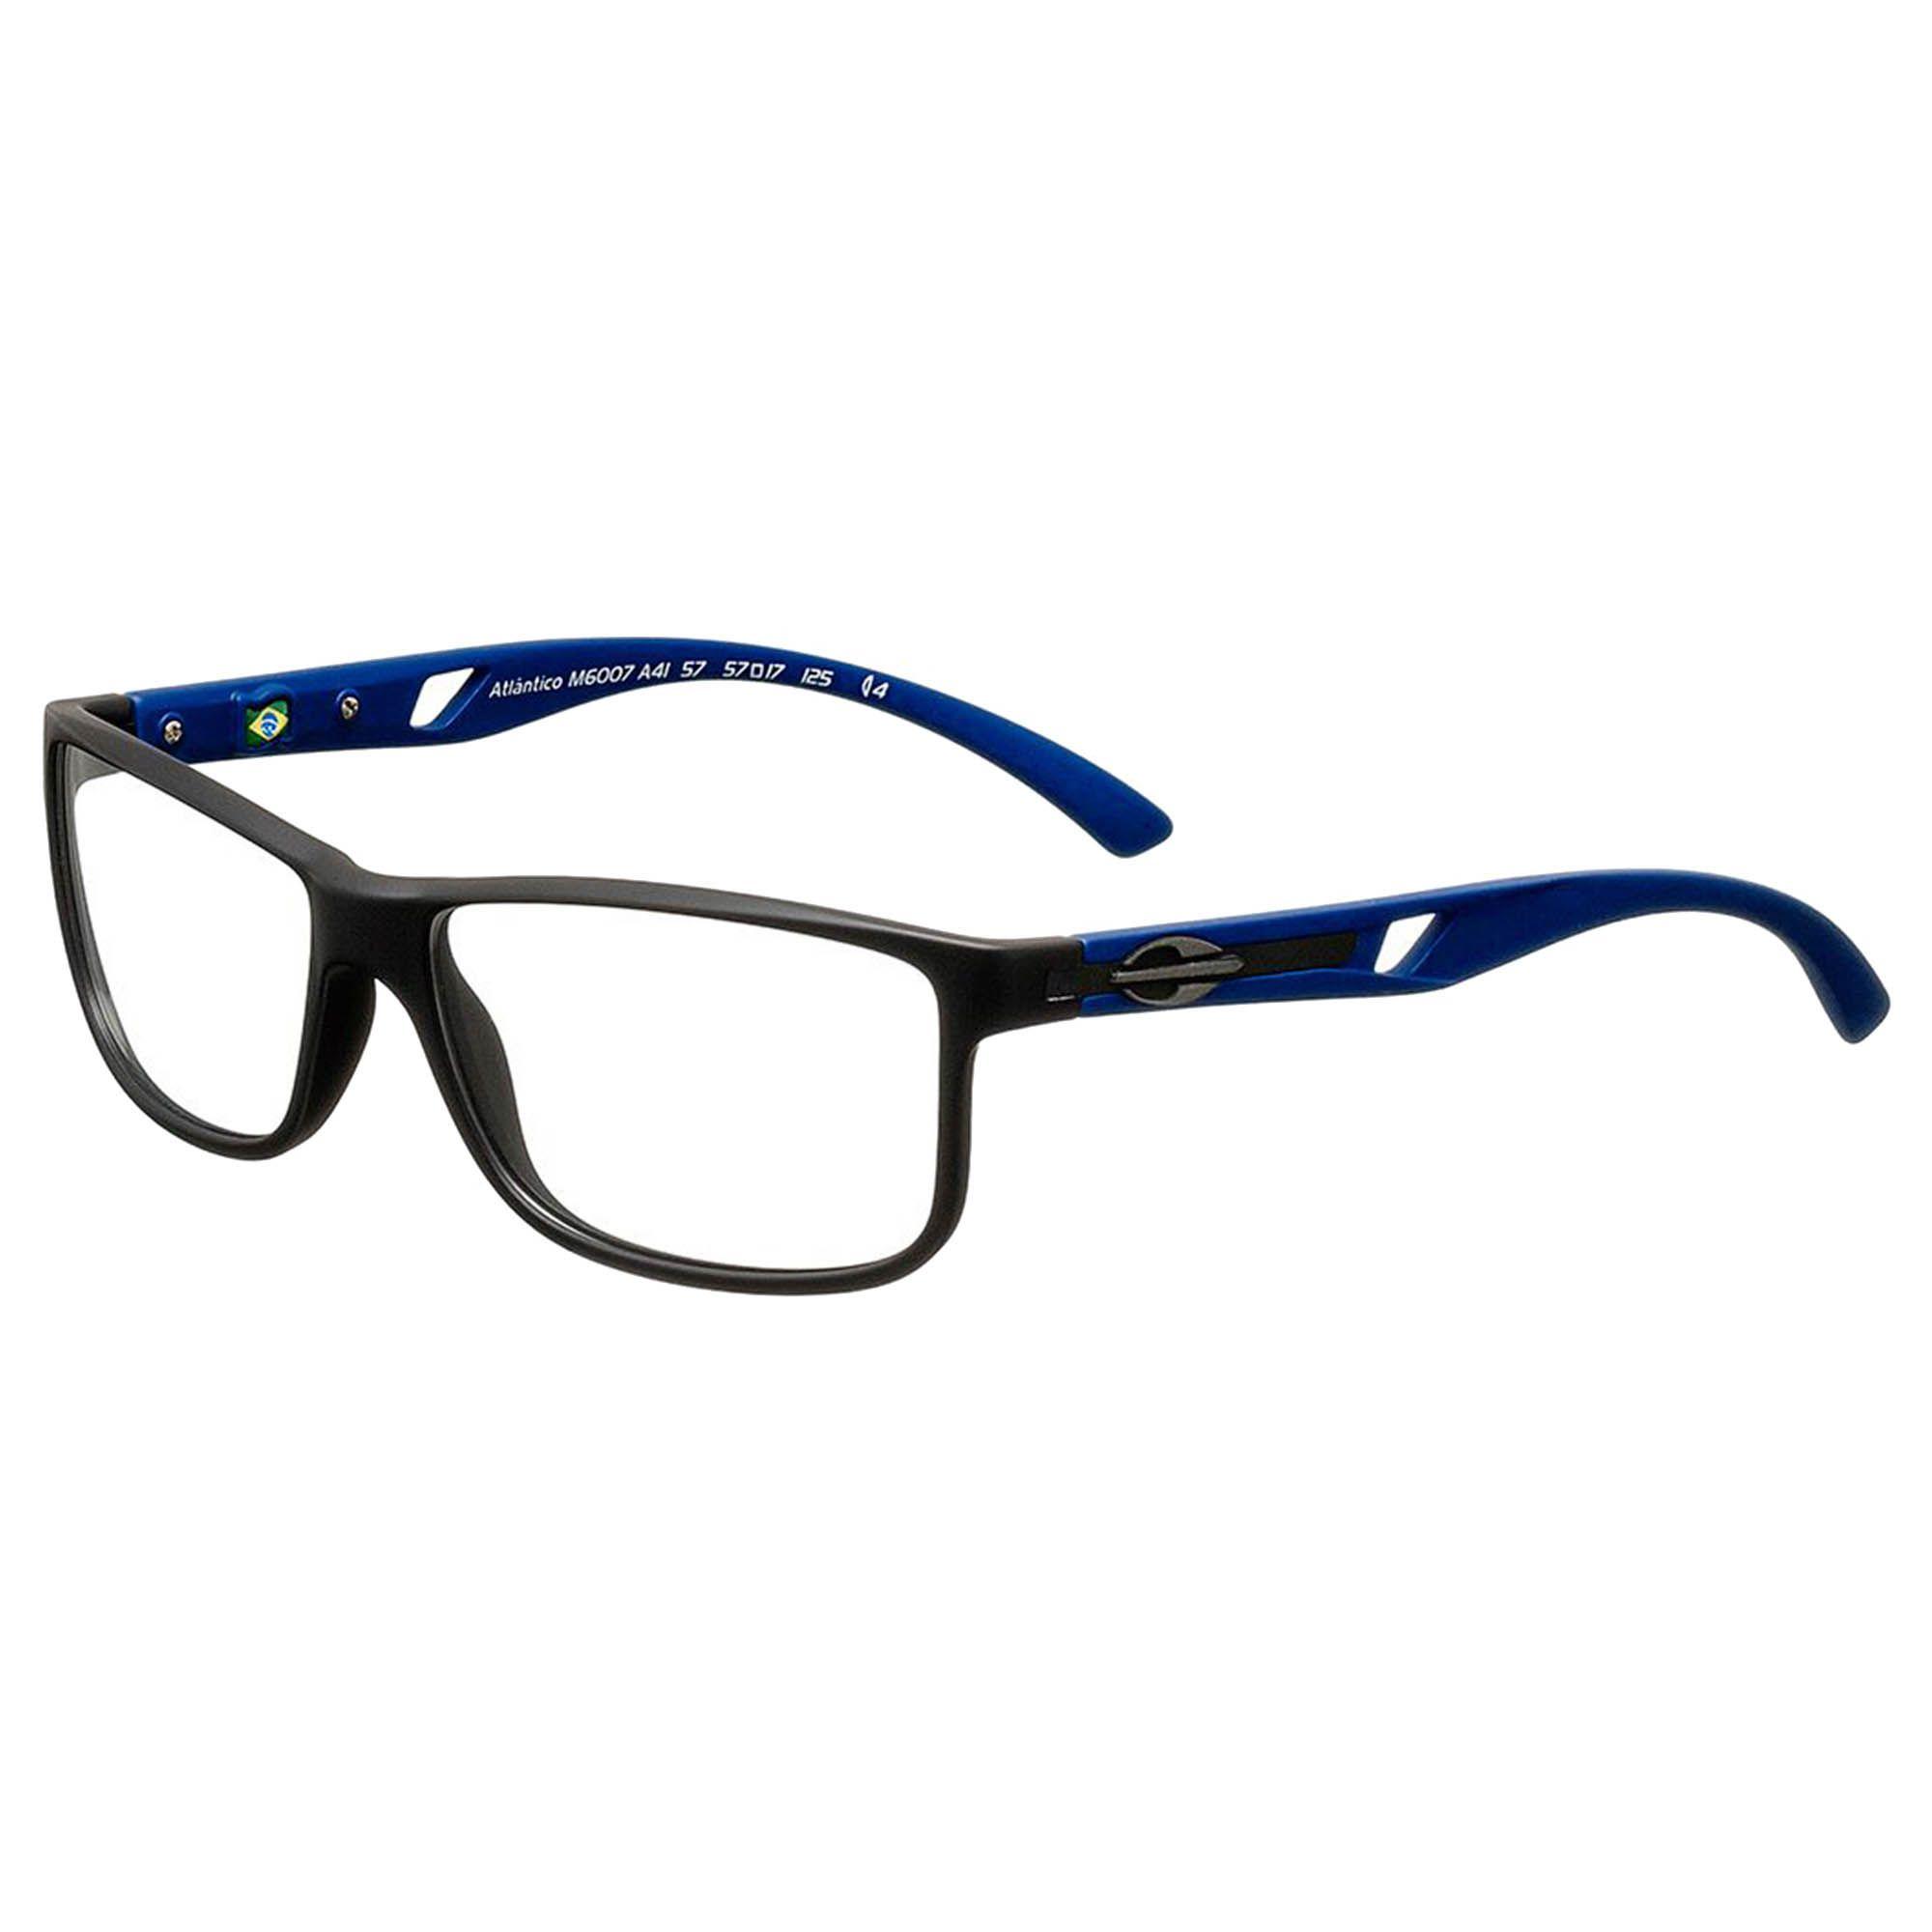 Óculos de Grau Masculino Mormaii Atlantico M6007A4157